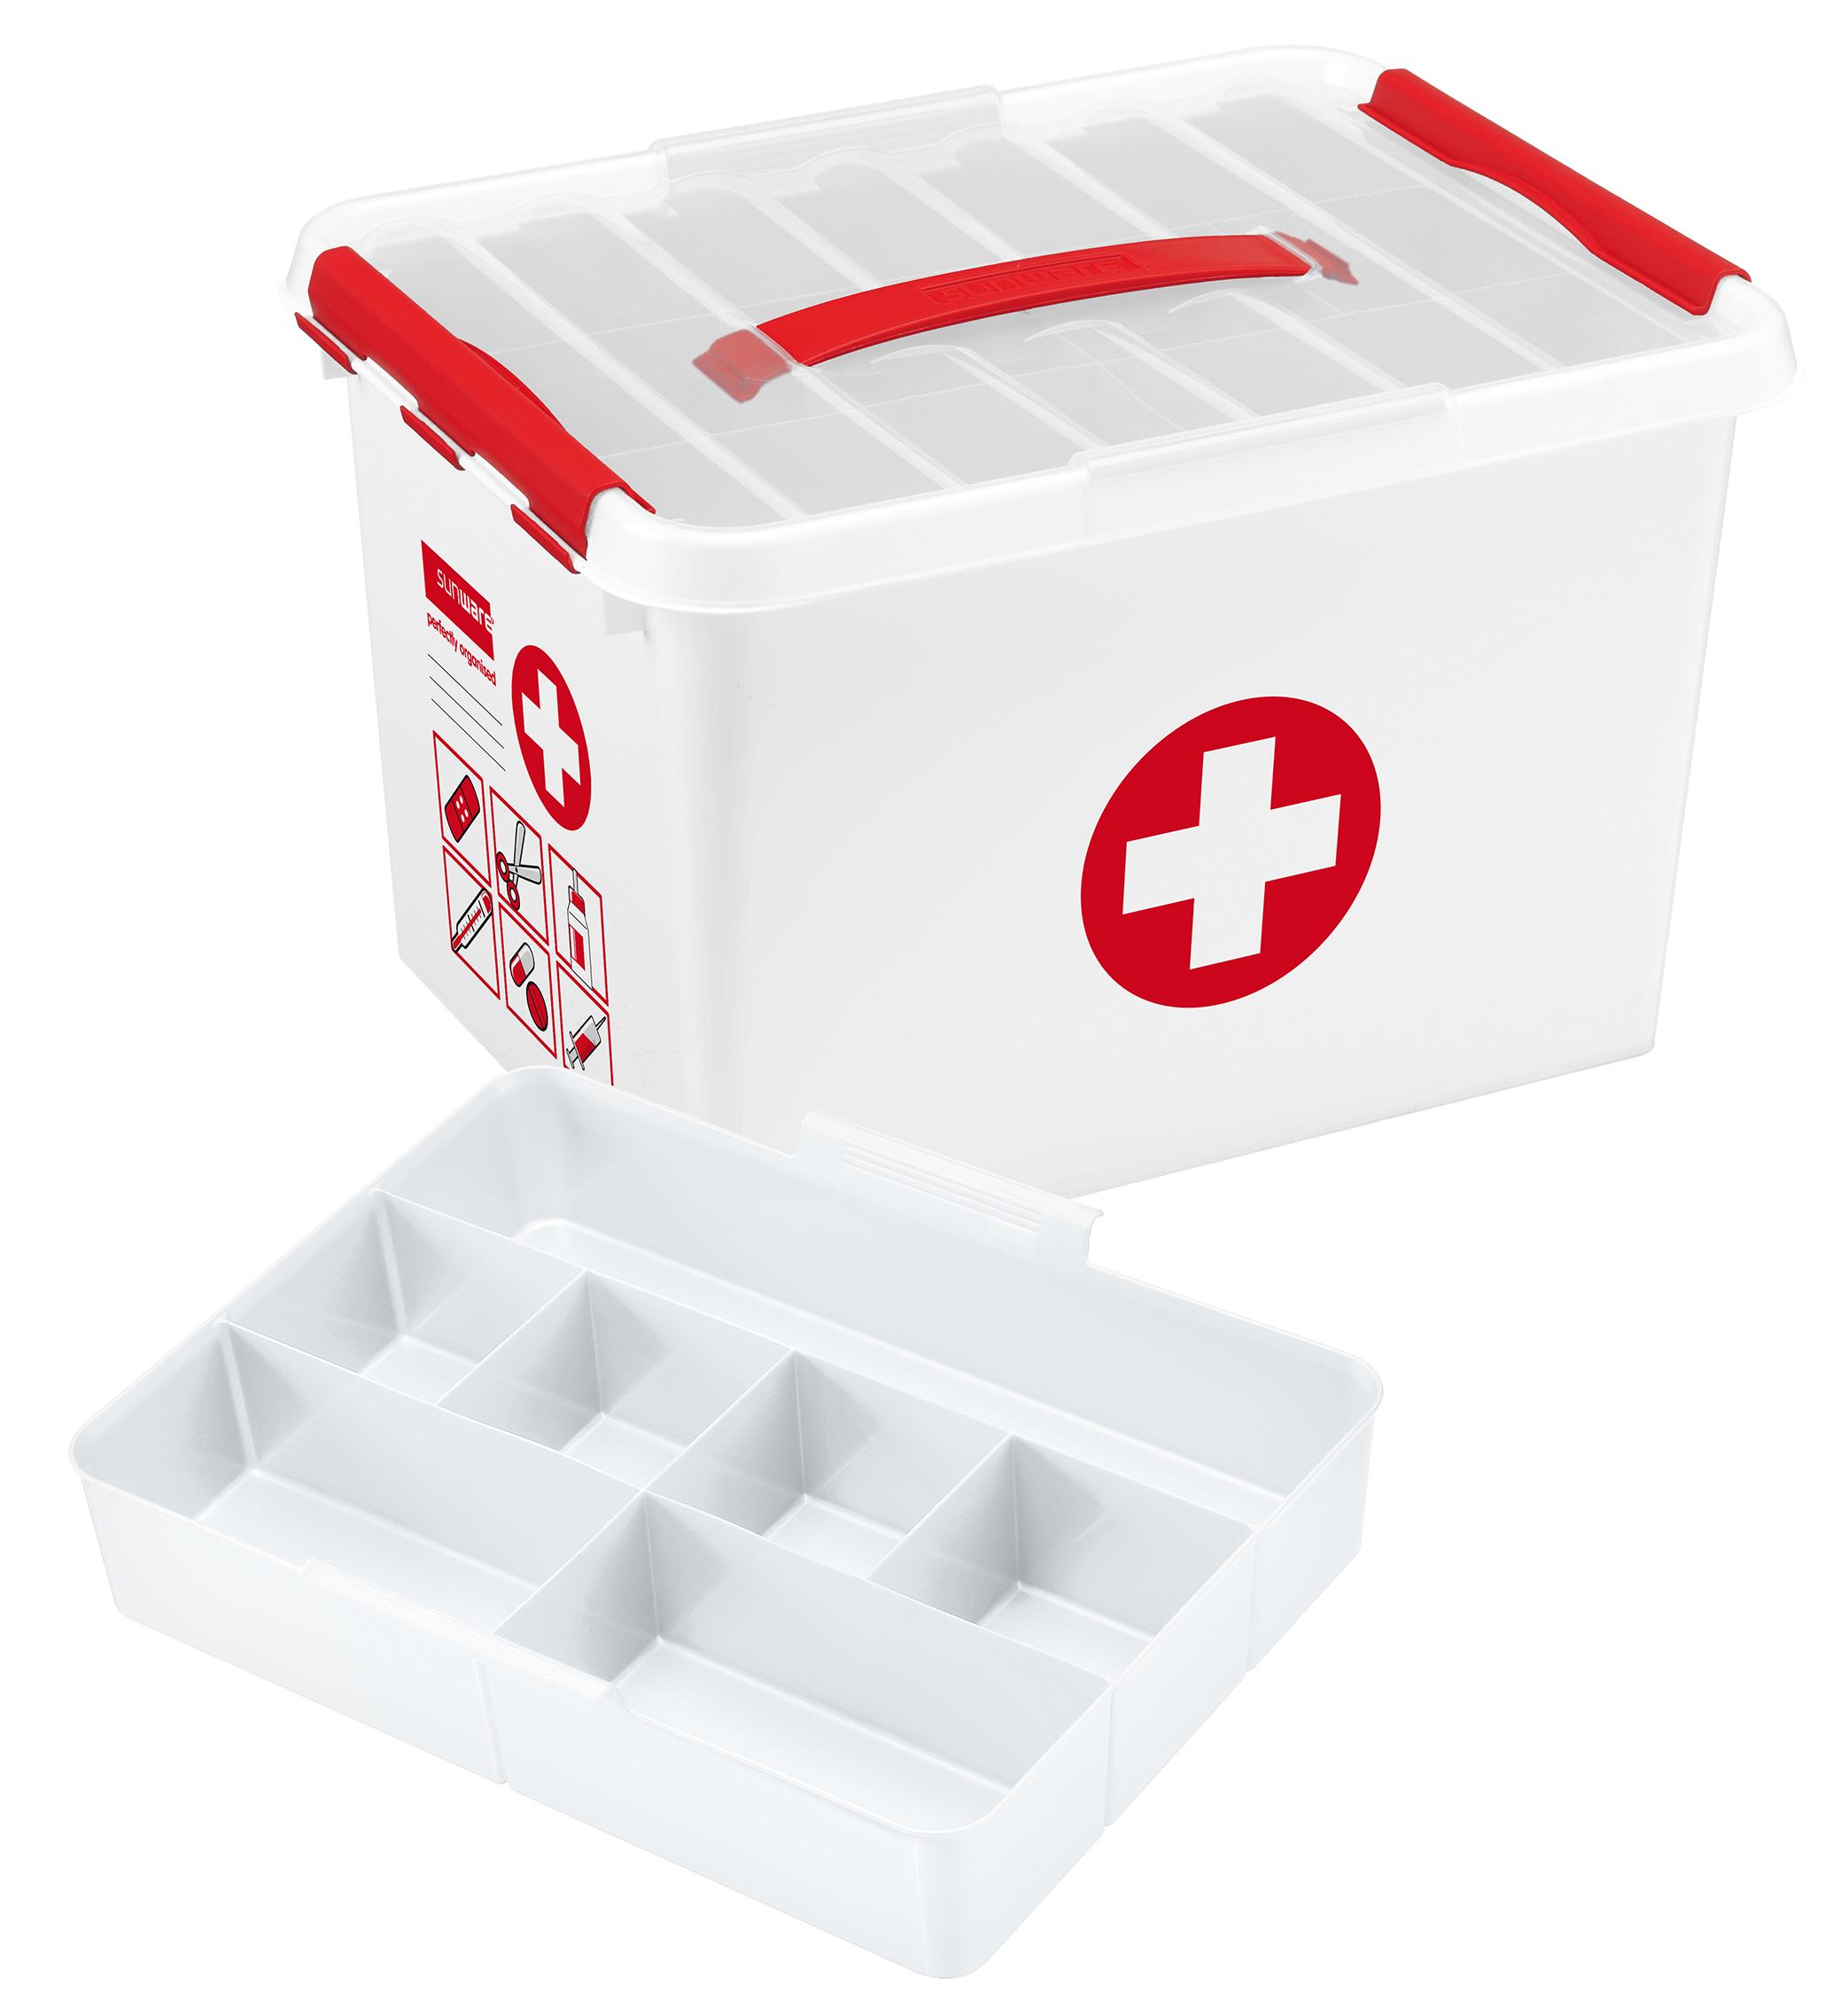 Tolle Medizinschrank Rahmen Kit Bilder - Rahmen Ideen ...